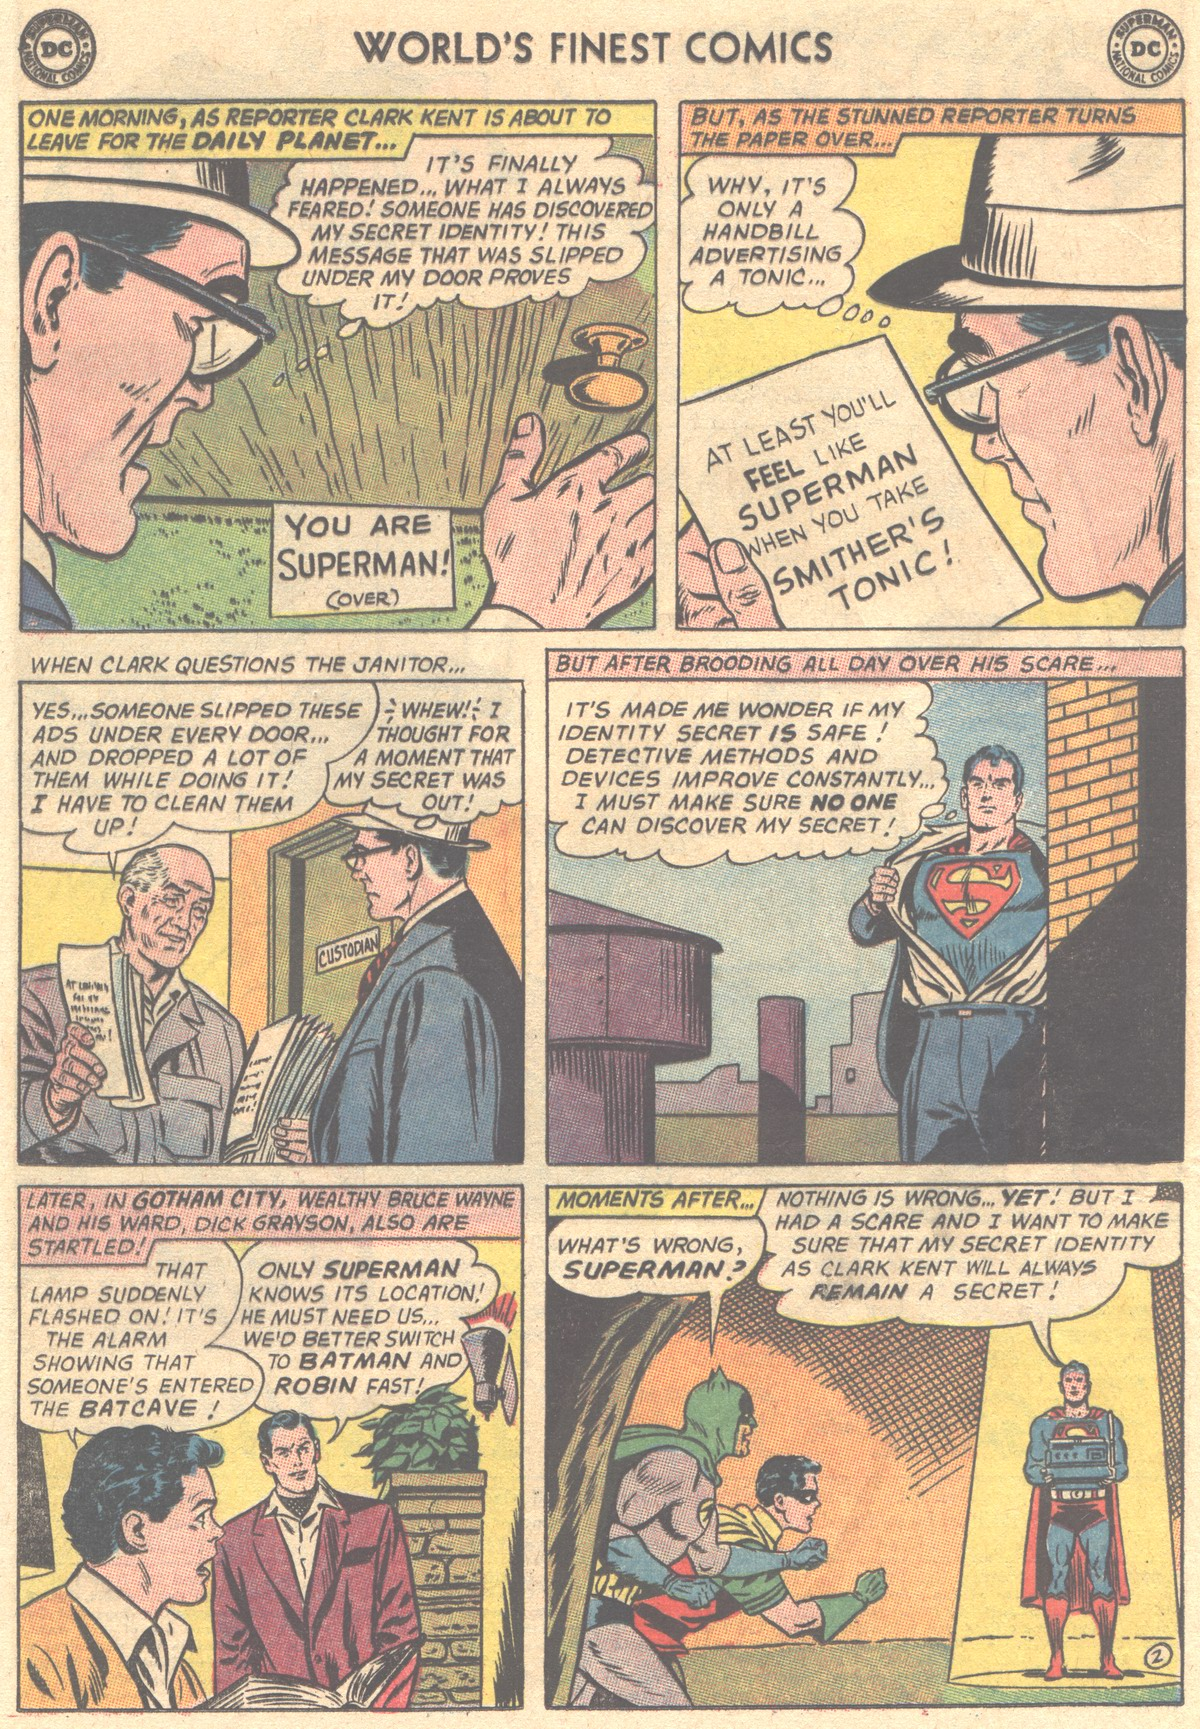 Read online World's Finest Comics comic -  Issue #149 - 4